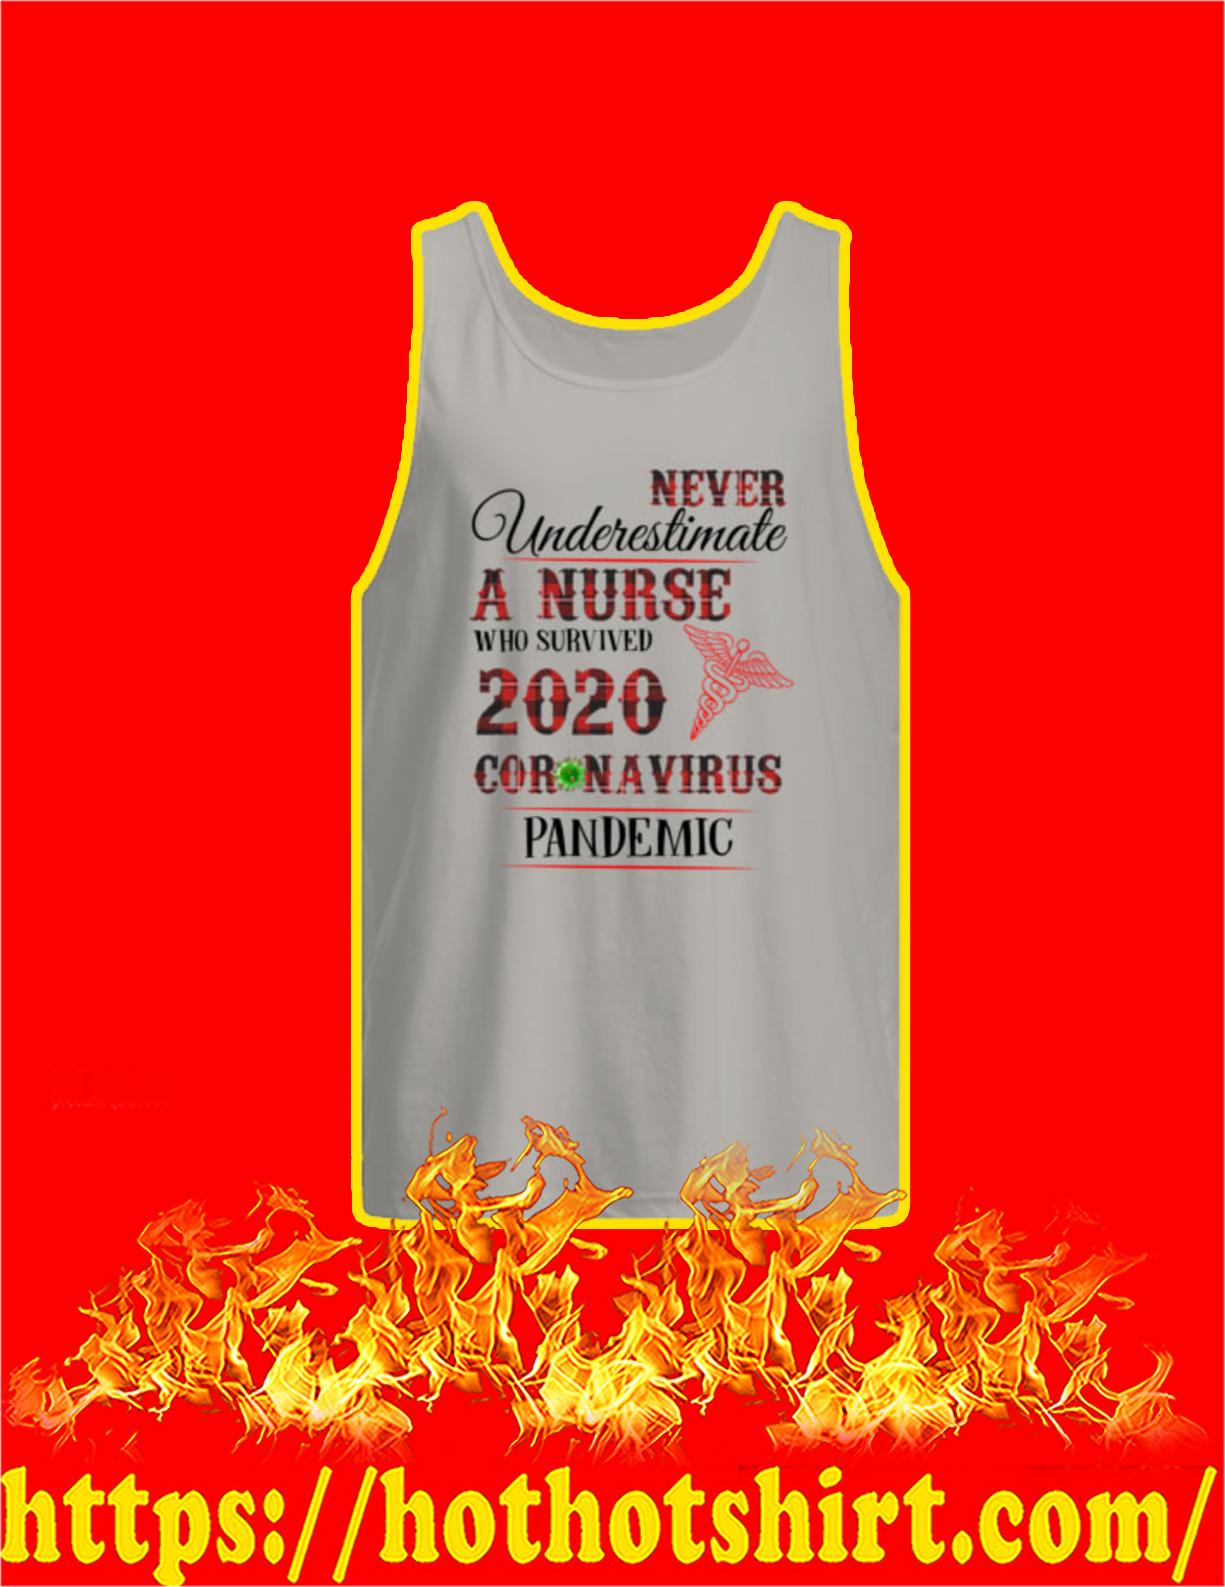 Never Underestimate A Nurse Who Survived 2020 Coronavirus Pandemic Tank Top